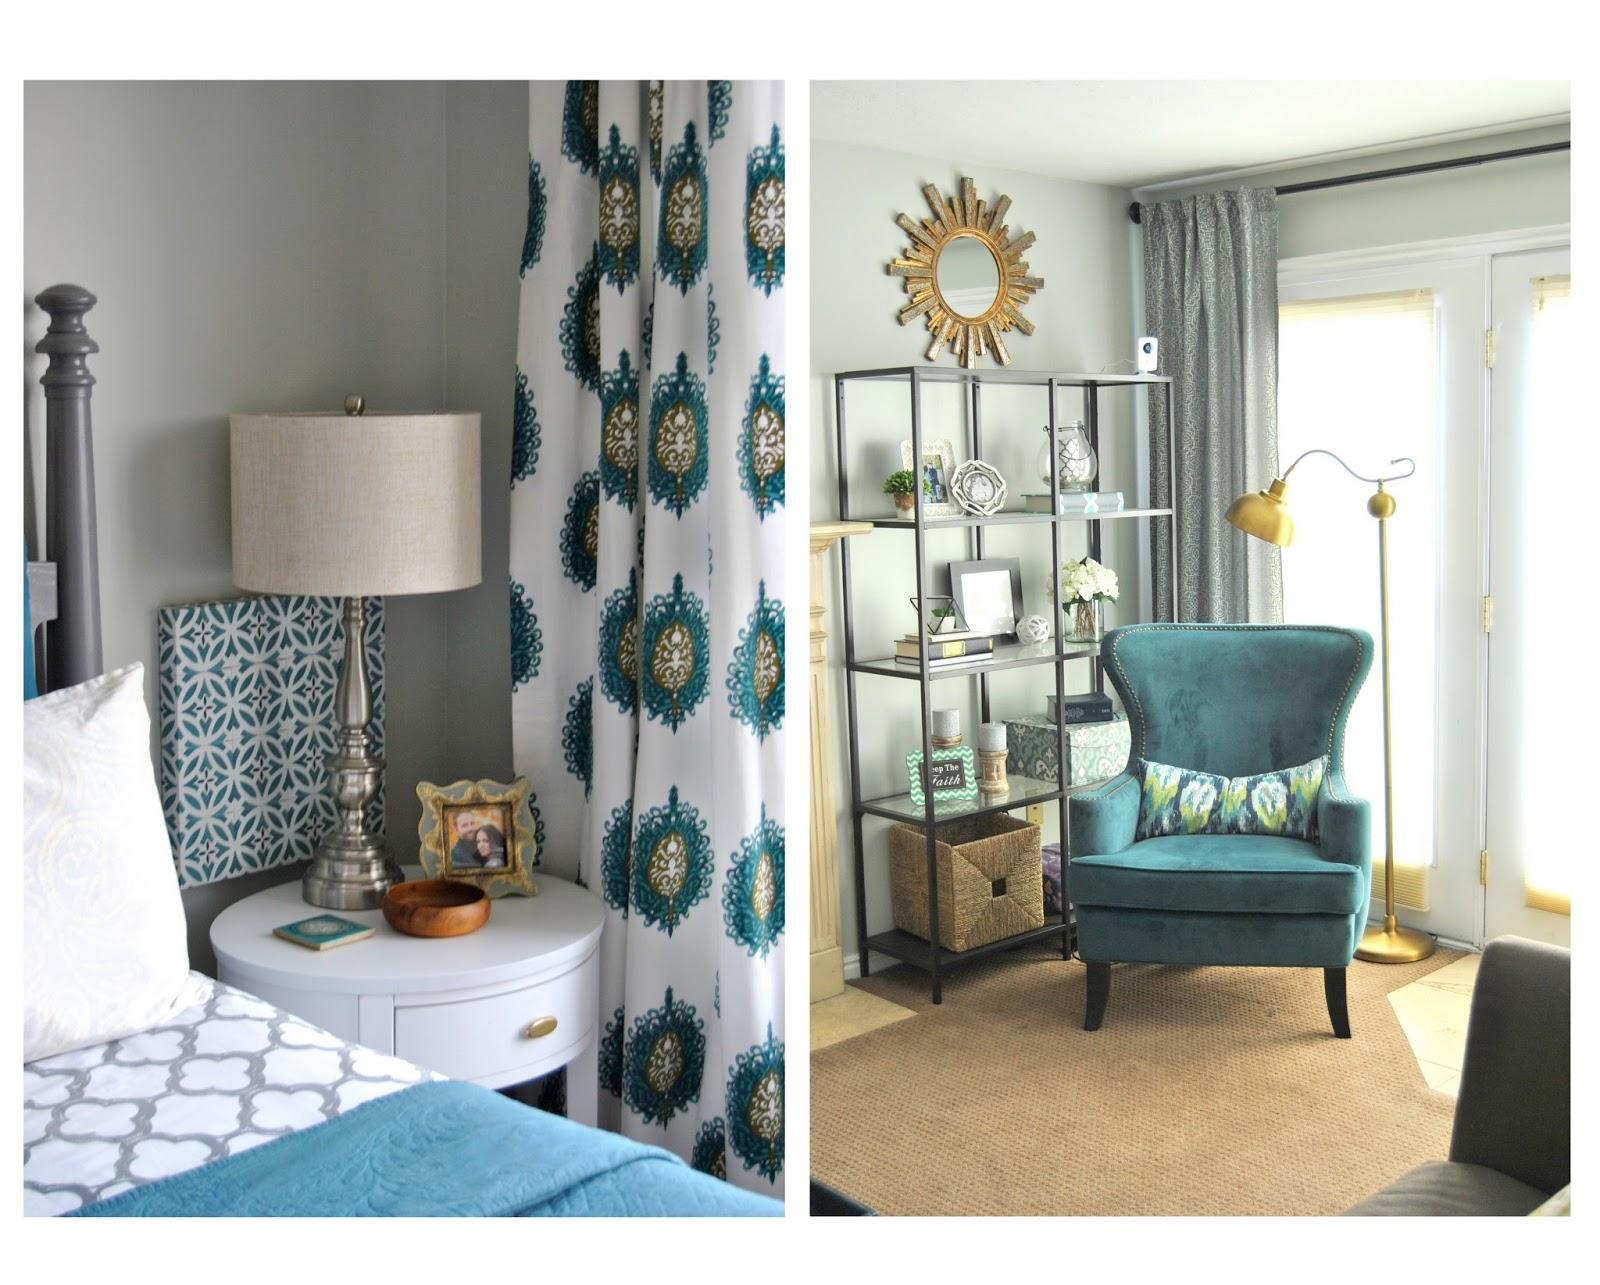 Greatest Studio 7 Interior Design: The Friday Five: Curtain Panels LA68